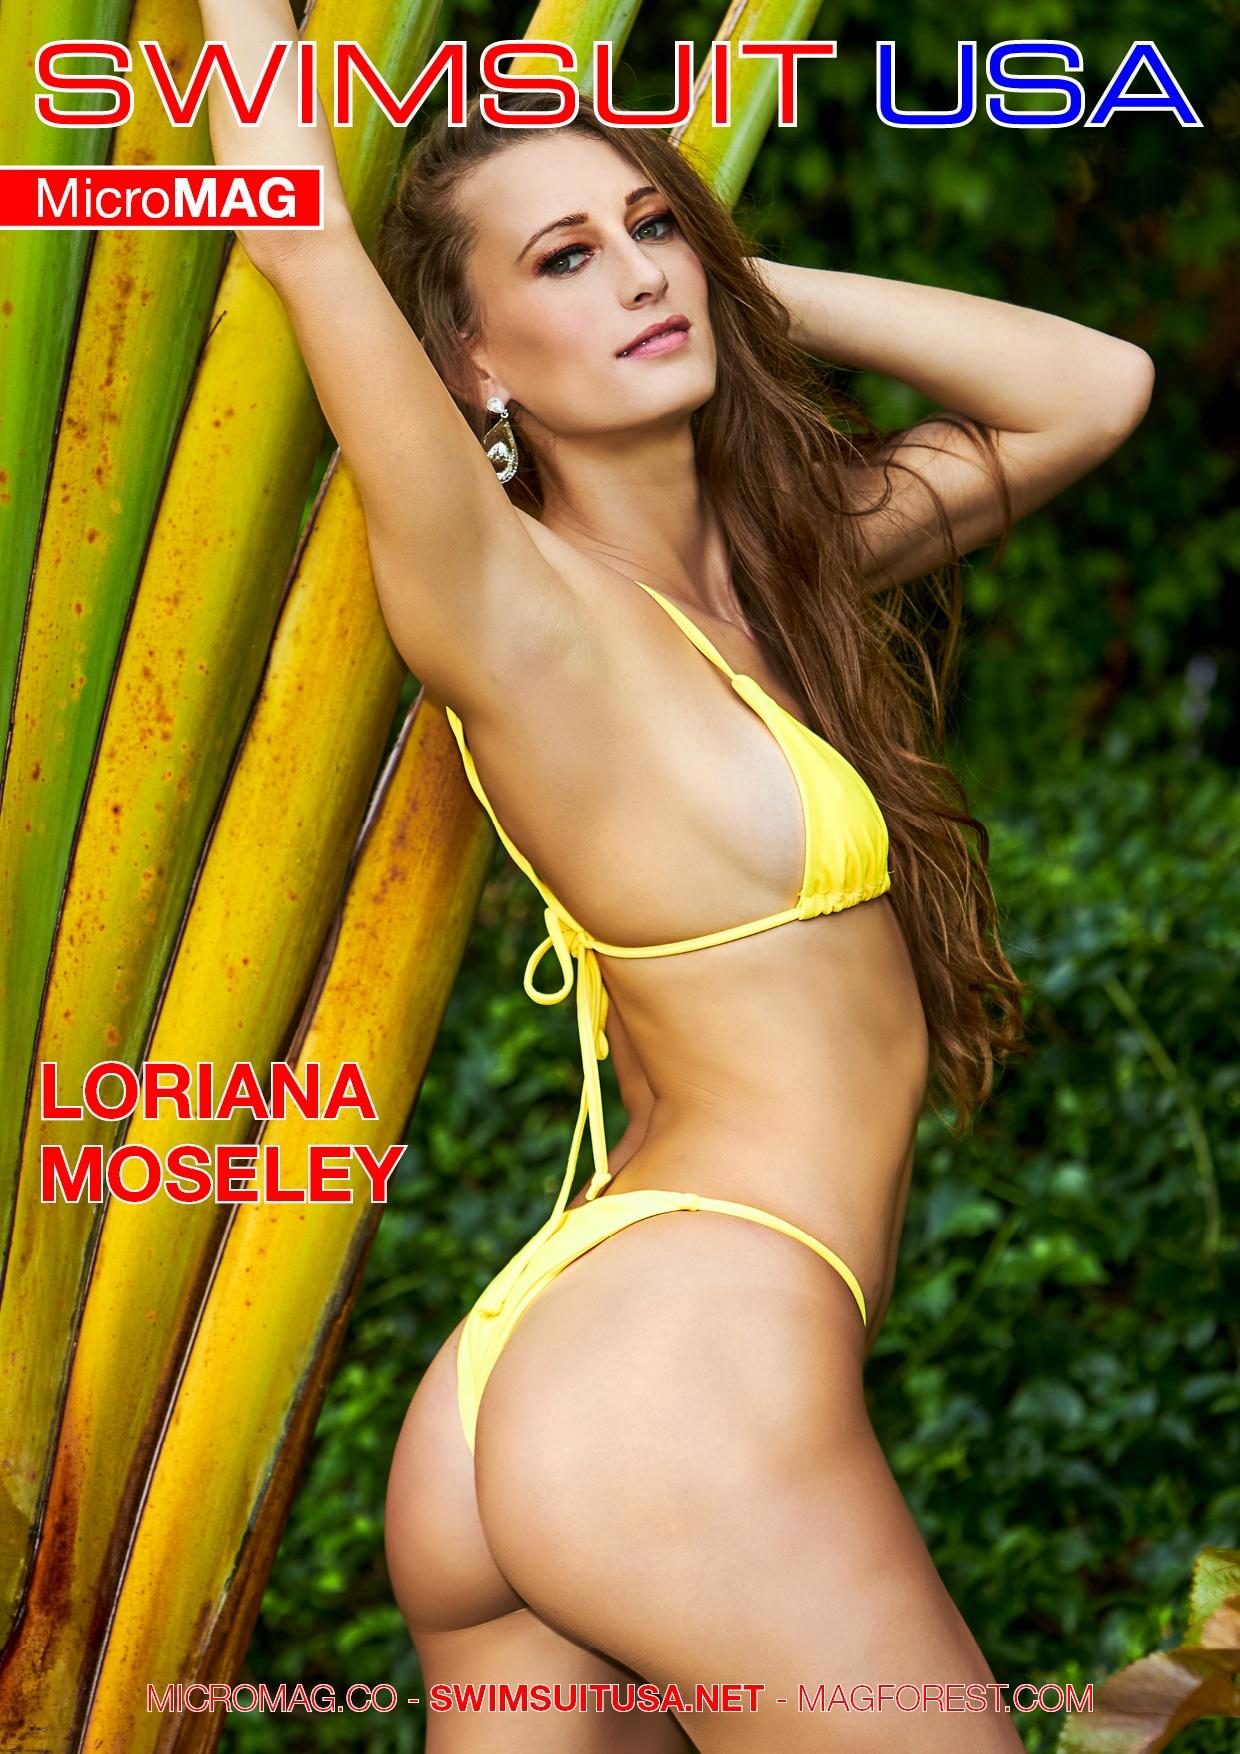 Swimsuit USA MicroMAG - Loriana Moseley